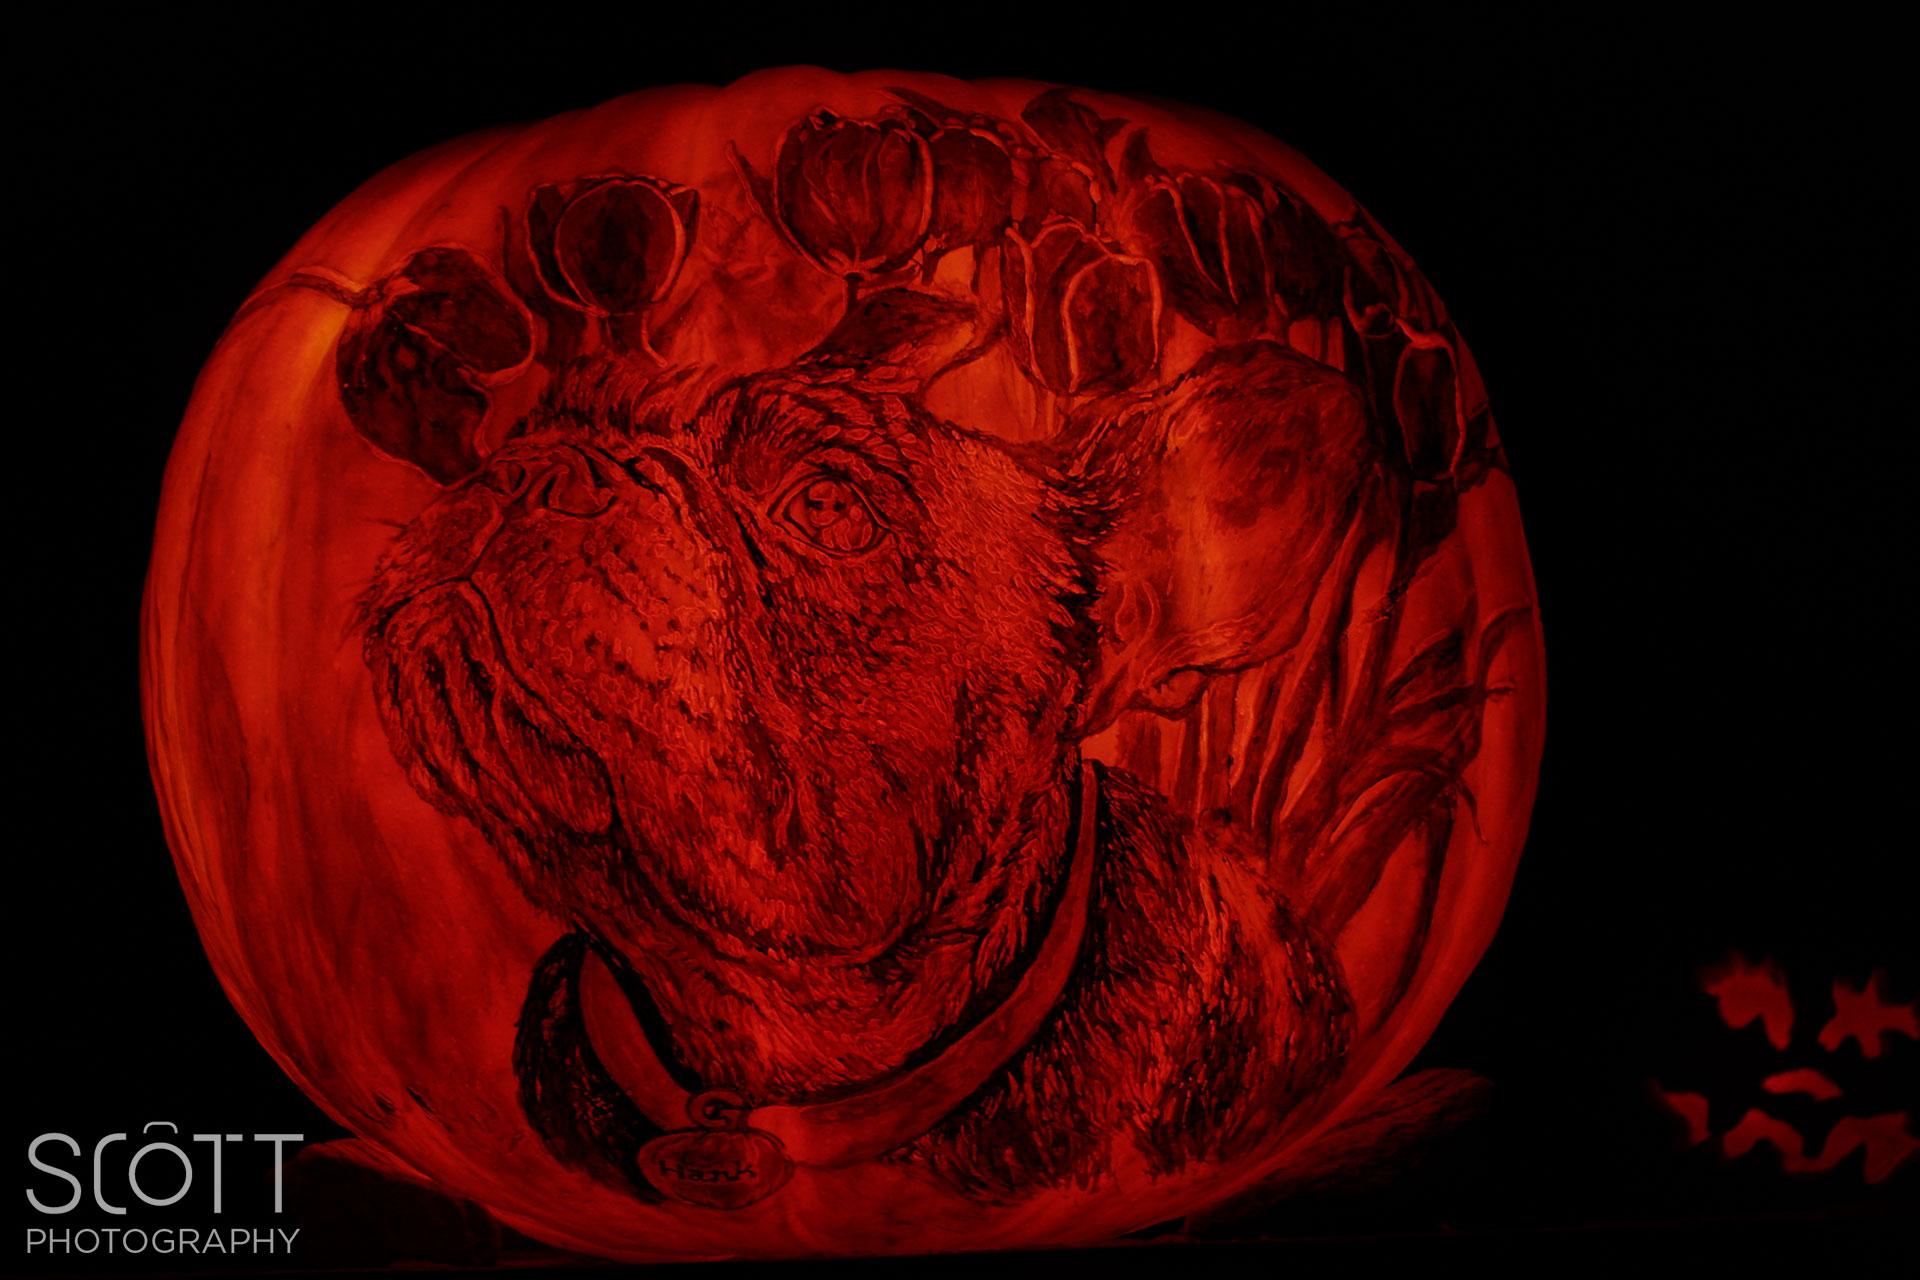 2014 roger williams jack-o-lantern spectacular - scott sousa photography